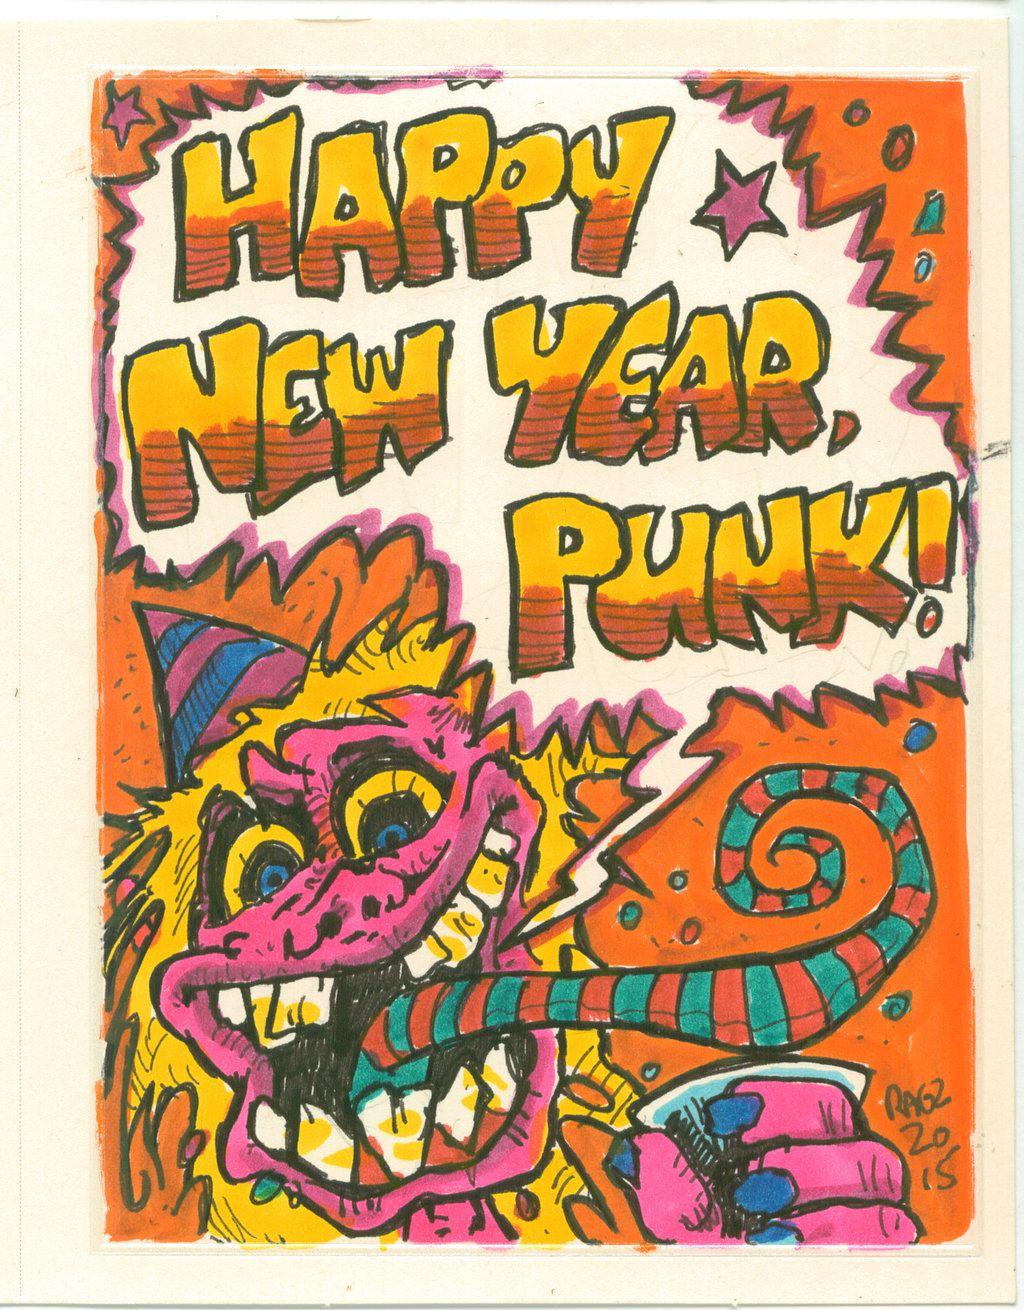 Happy New Year Punk!